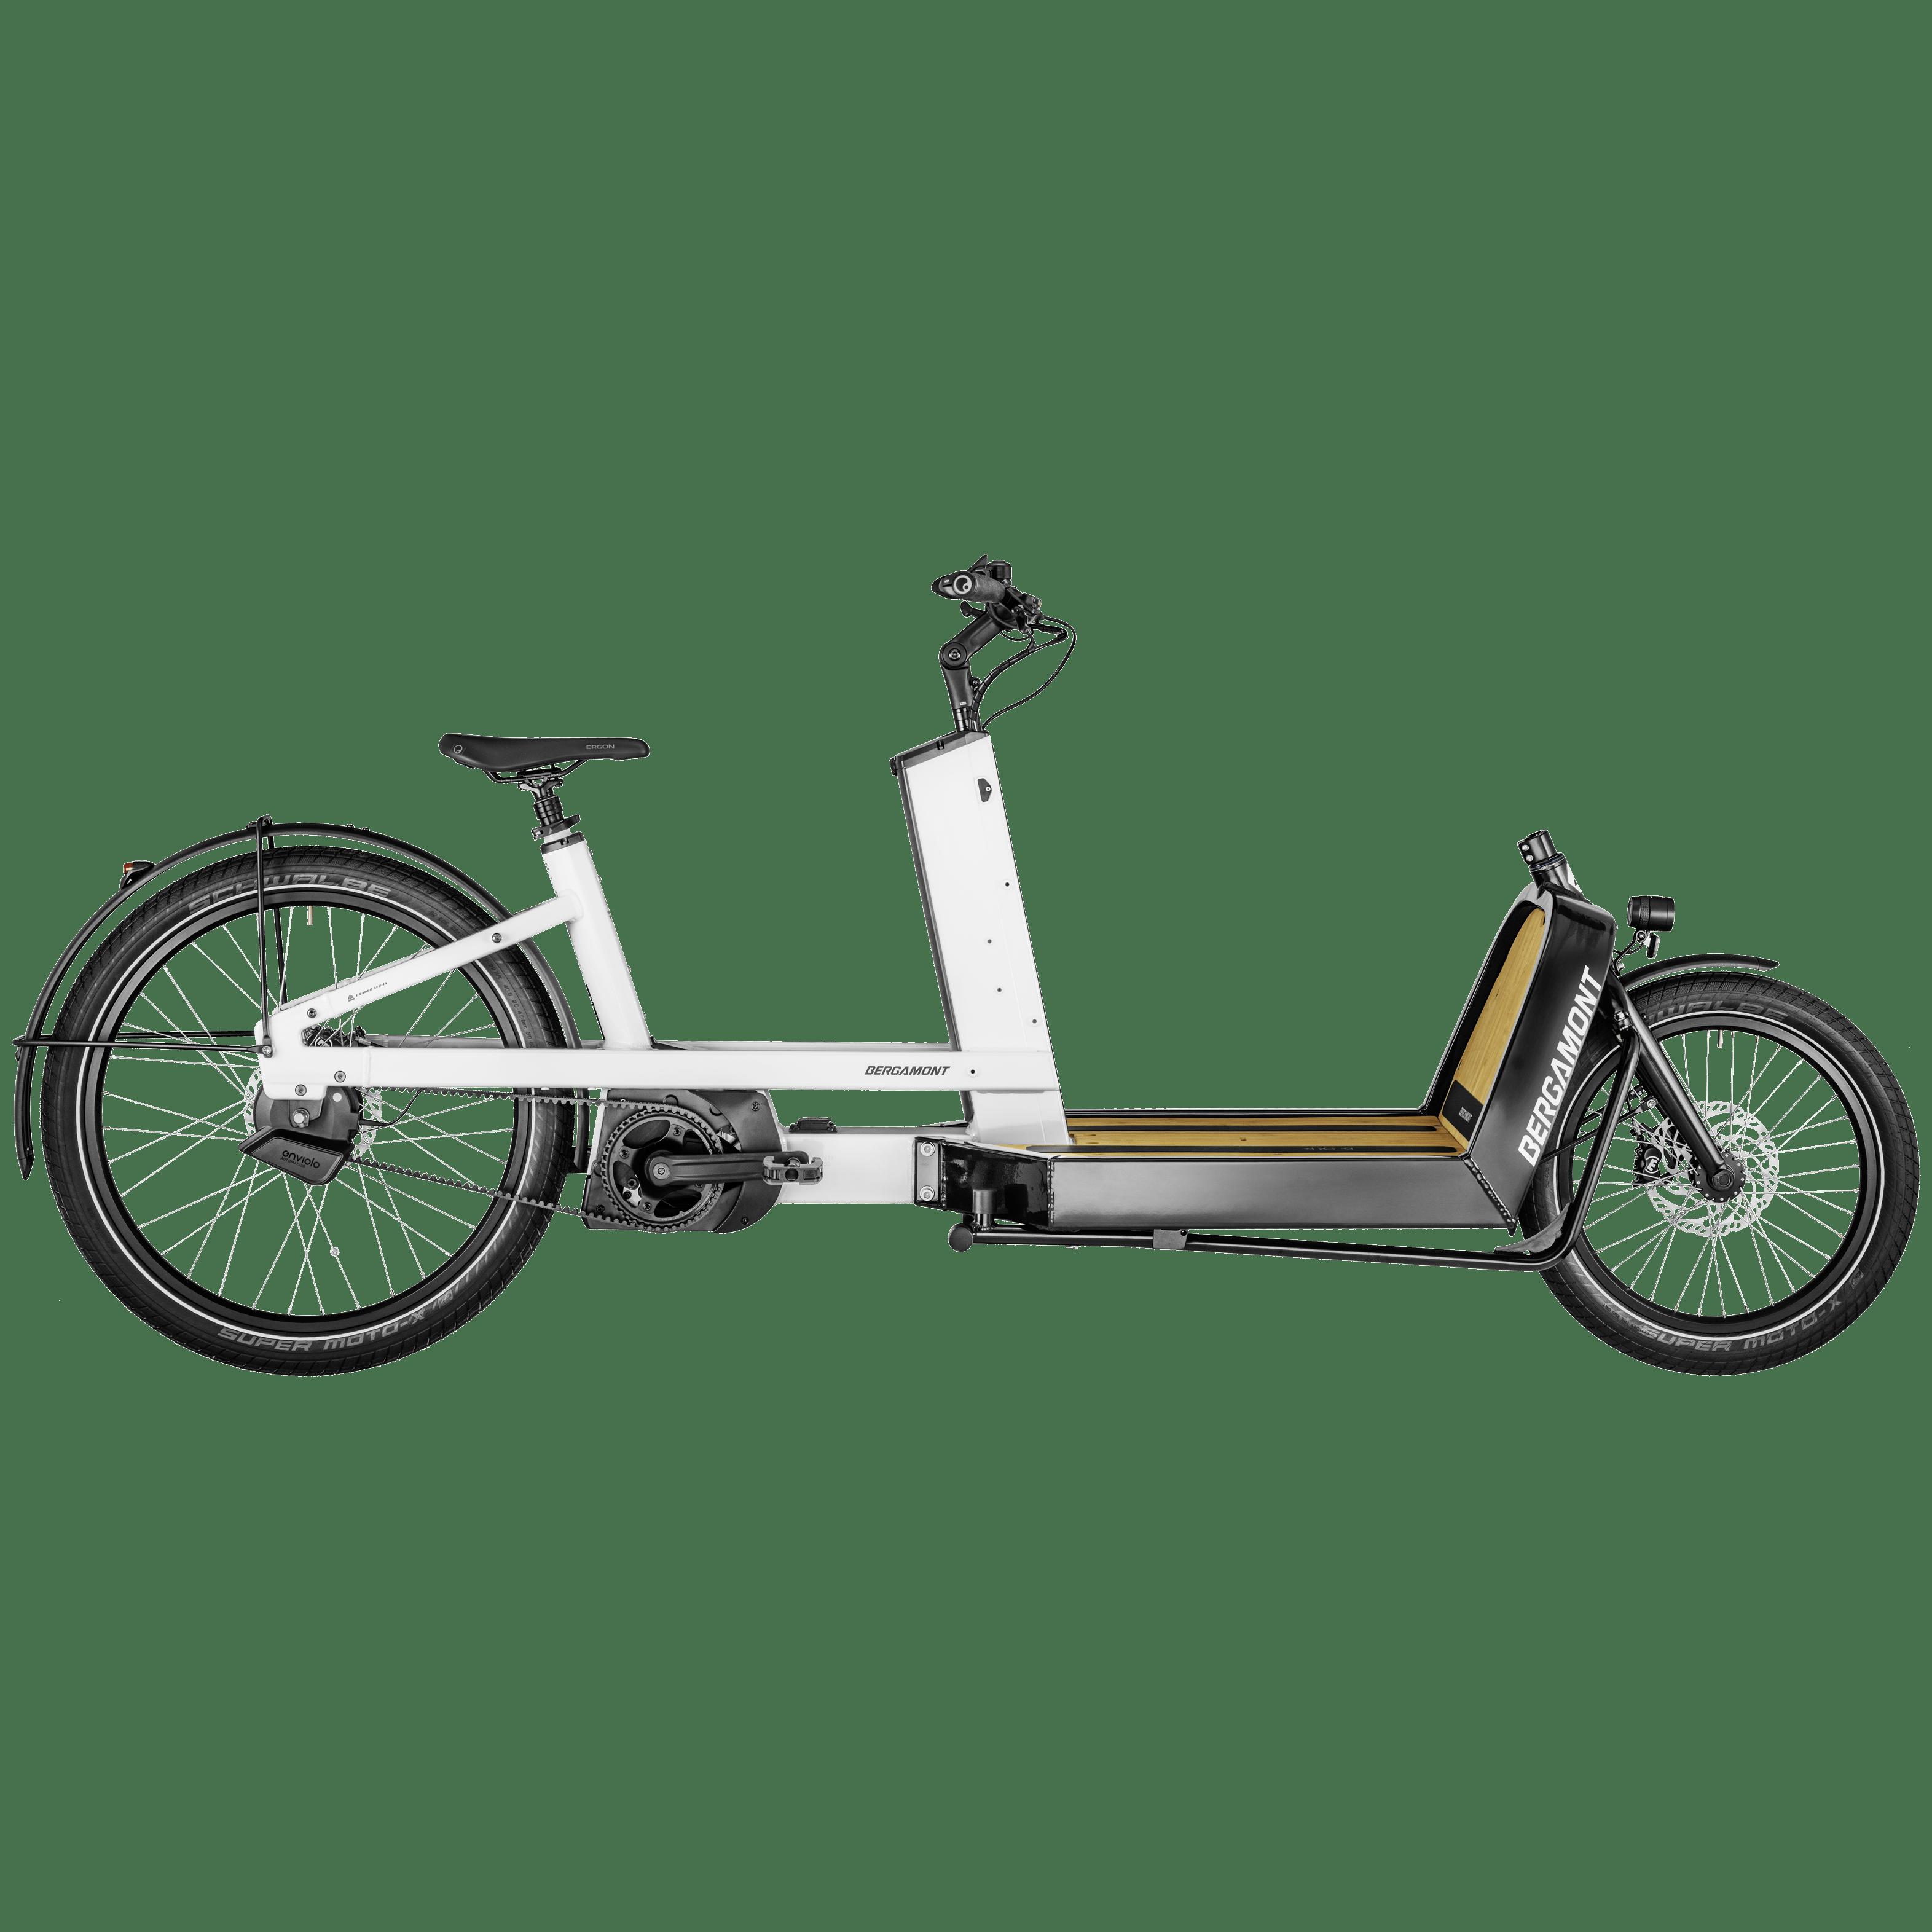 Esprit vélo BERGAMONT E-CARGOVILLE LJ ELITE C